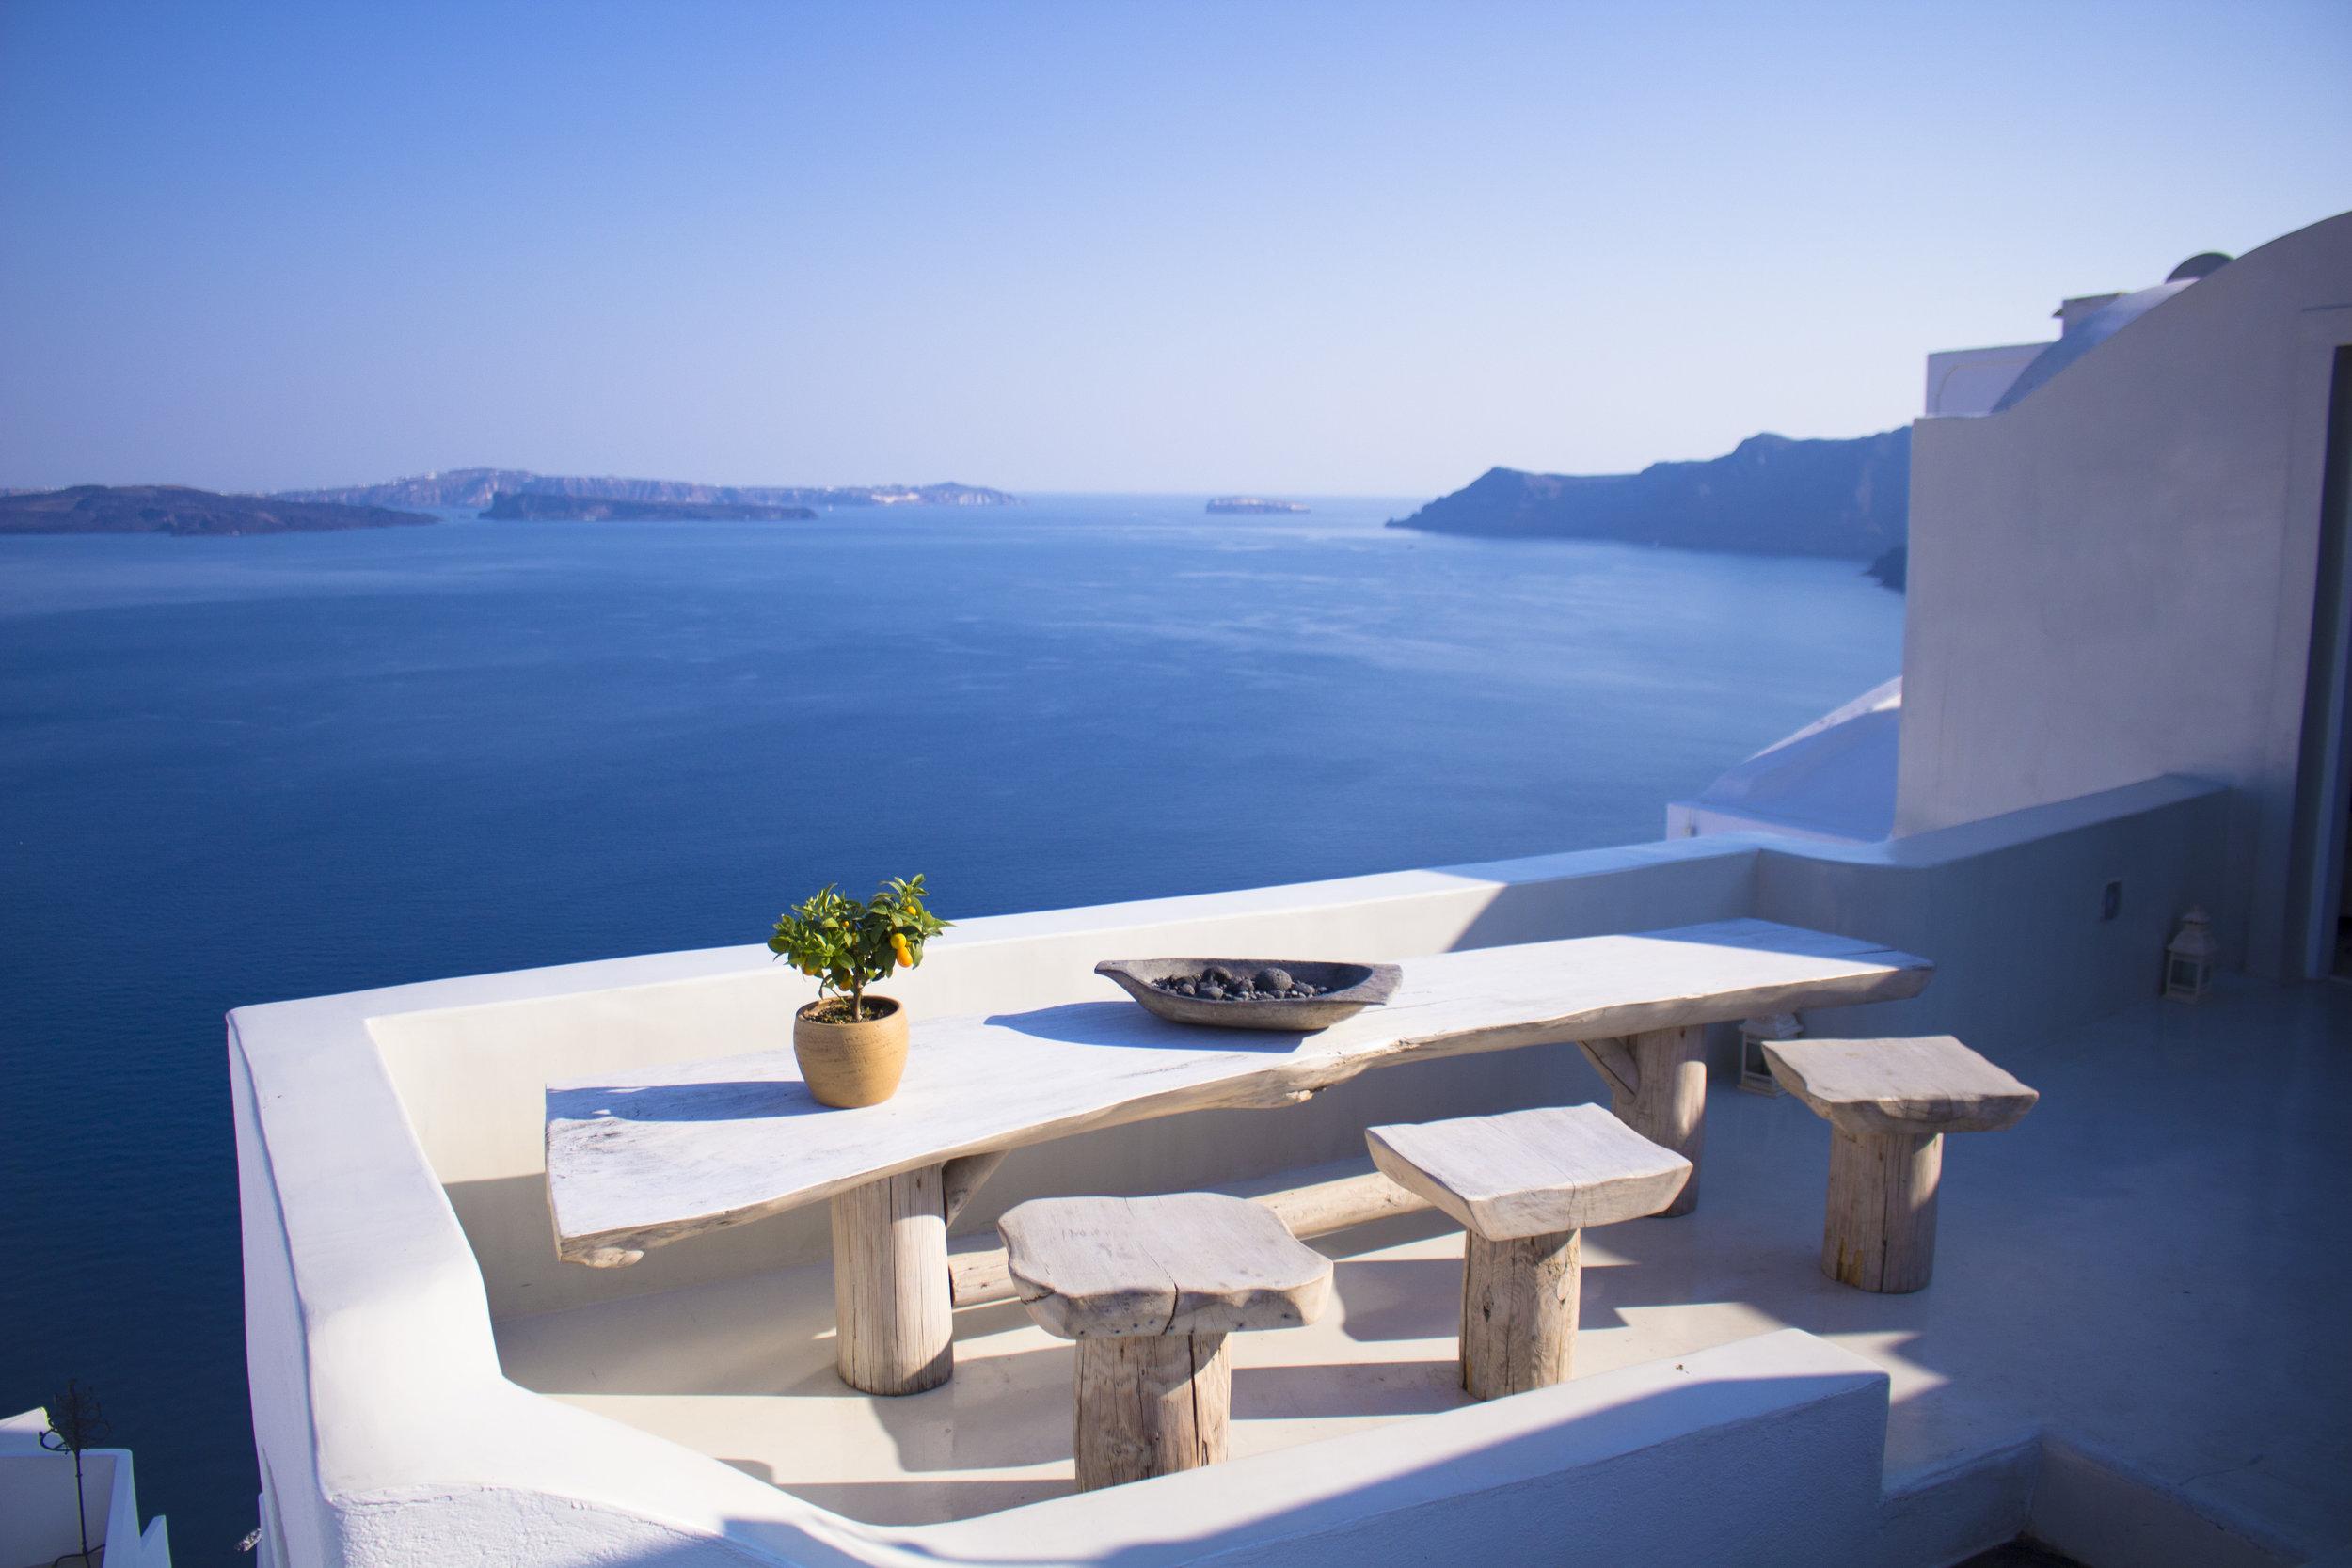 اقامت یونان و پاسپورت اروپا